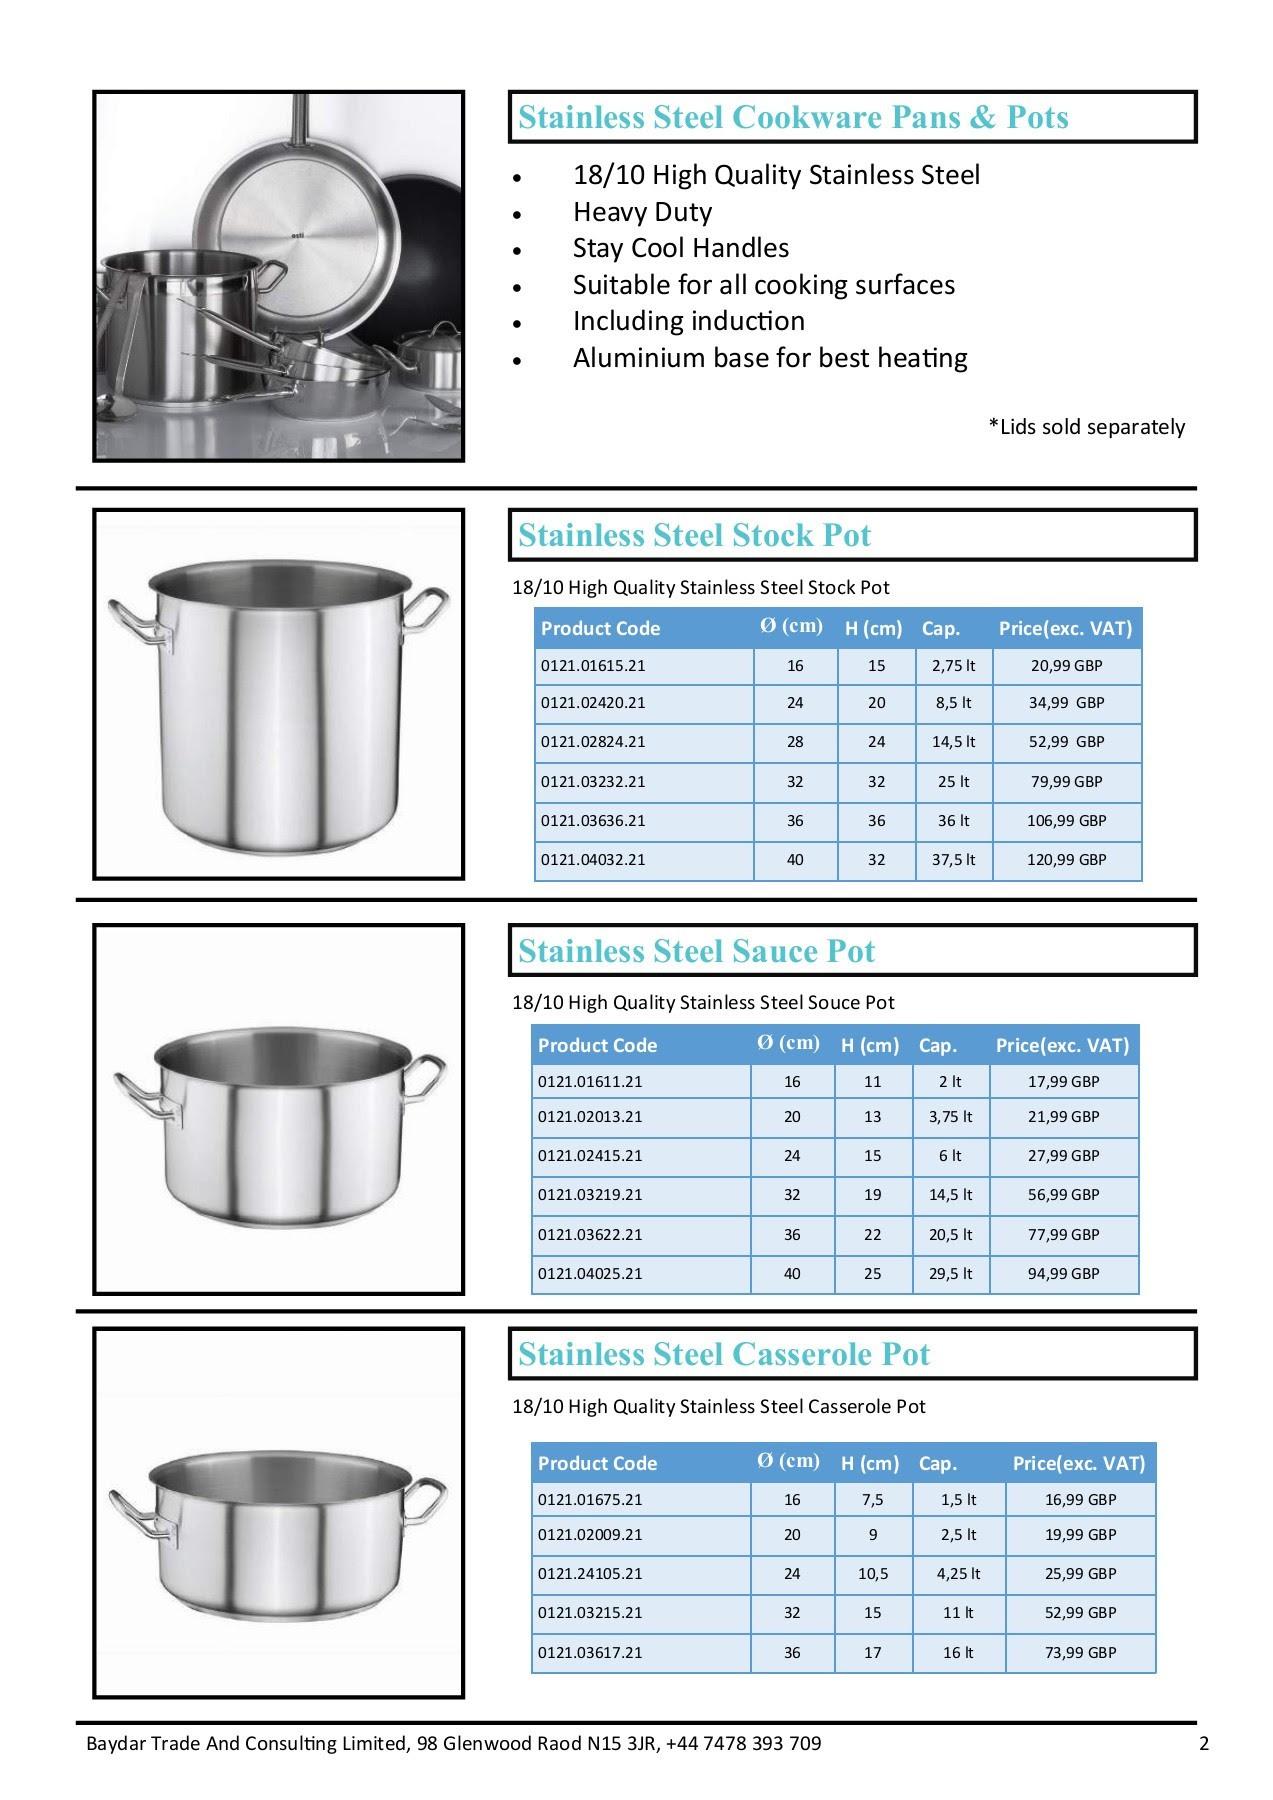 Baydar Catering Equipments Price List 2018